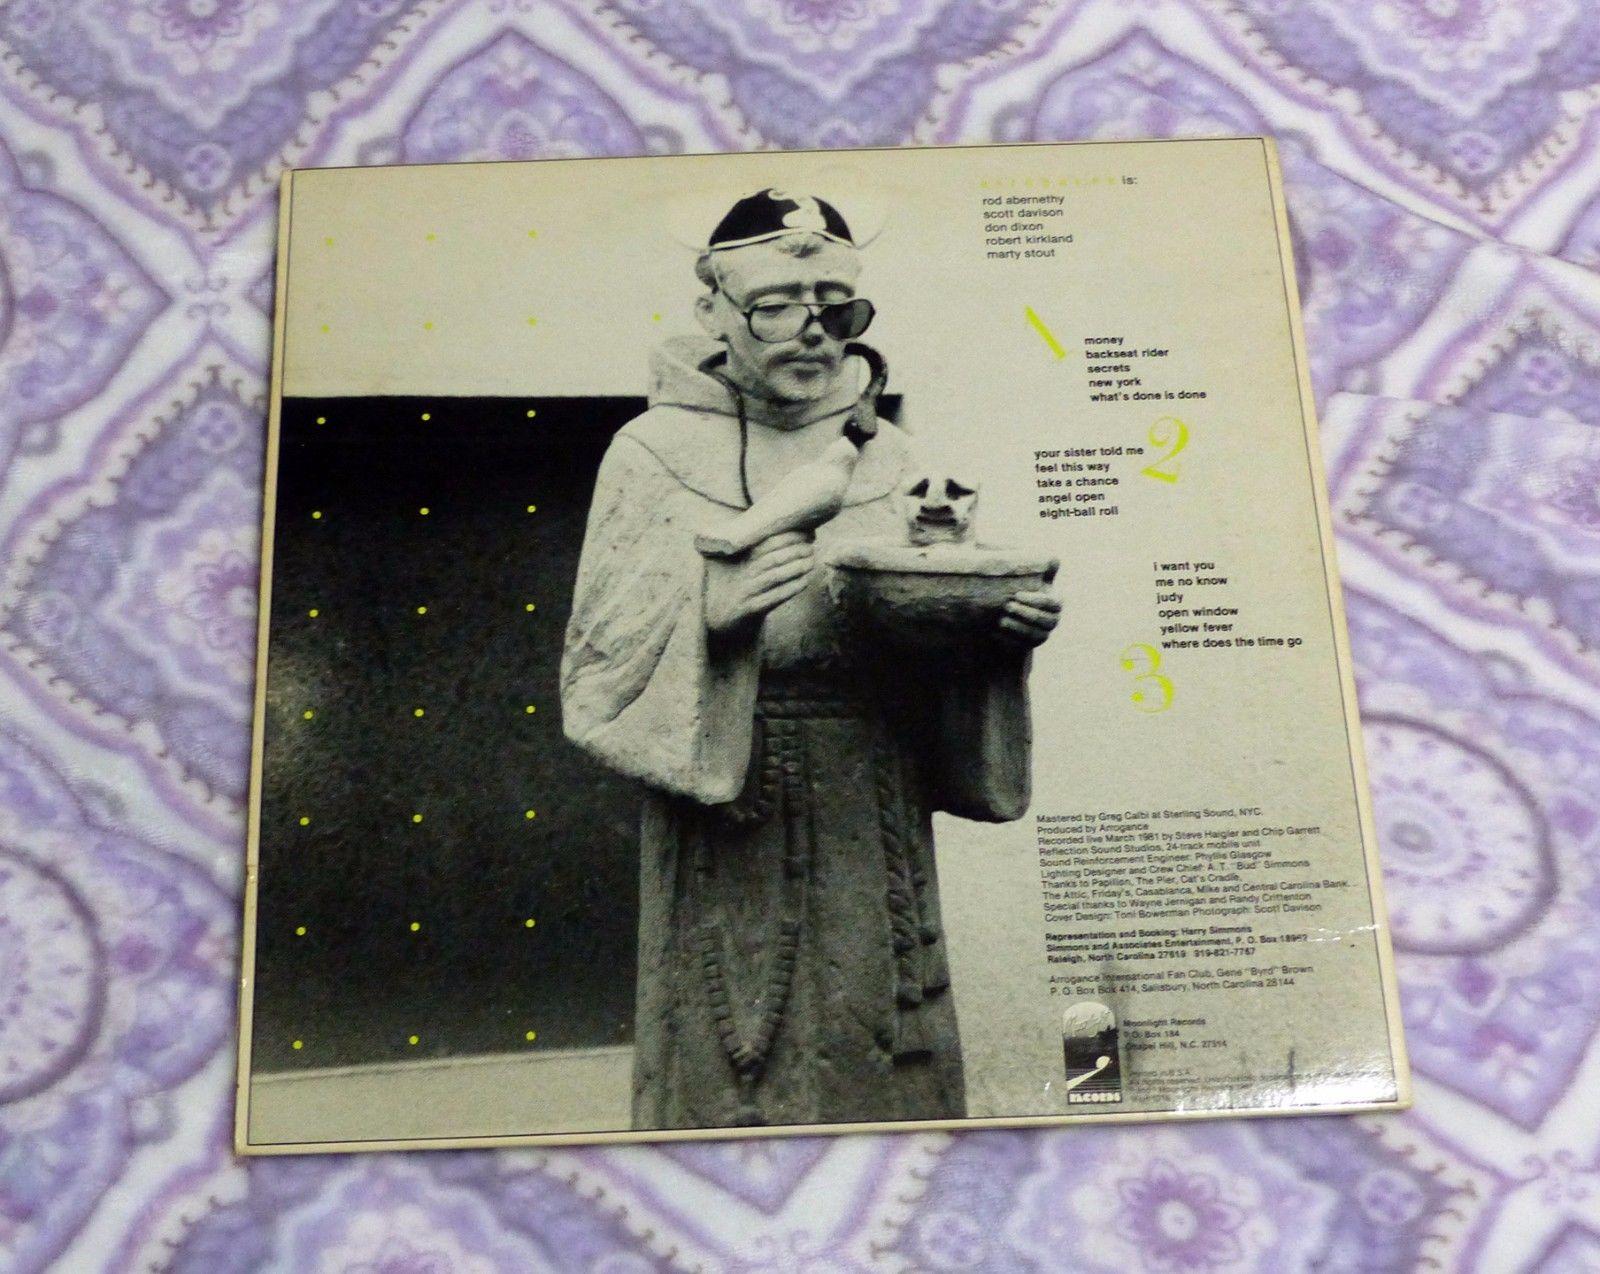 Arrogance Lively LP Vinyl Record Live Recording 03/1981 On 24 Track Mobile Unit